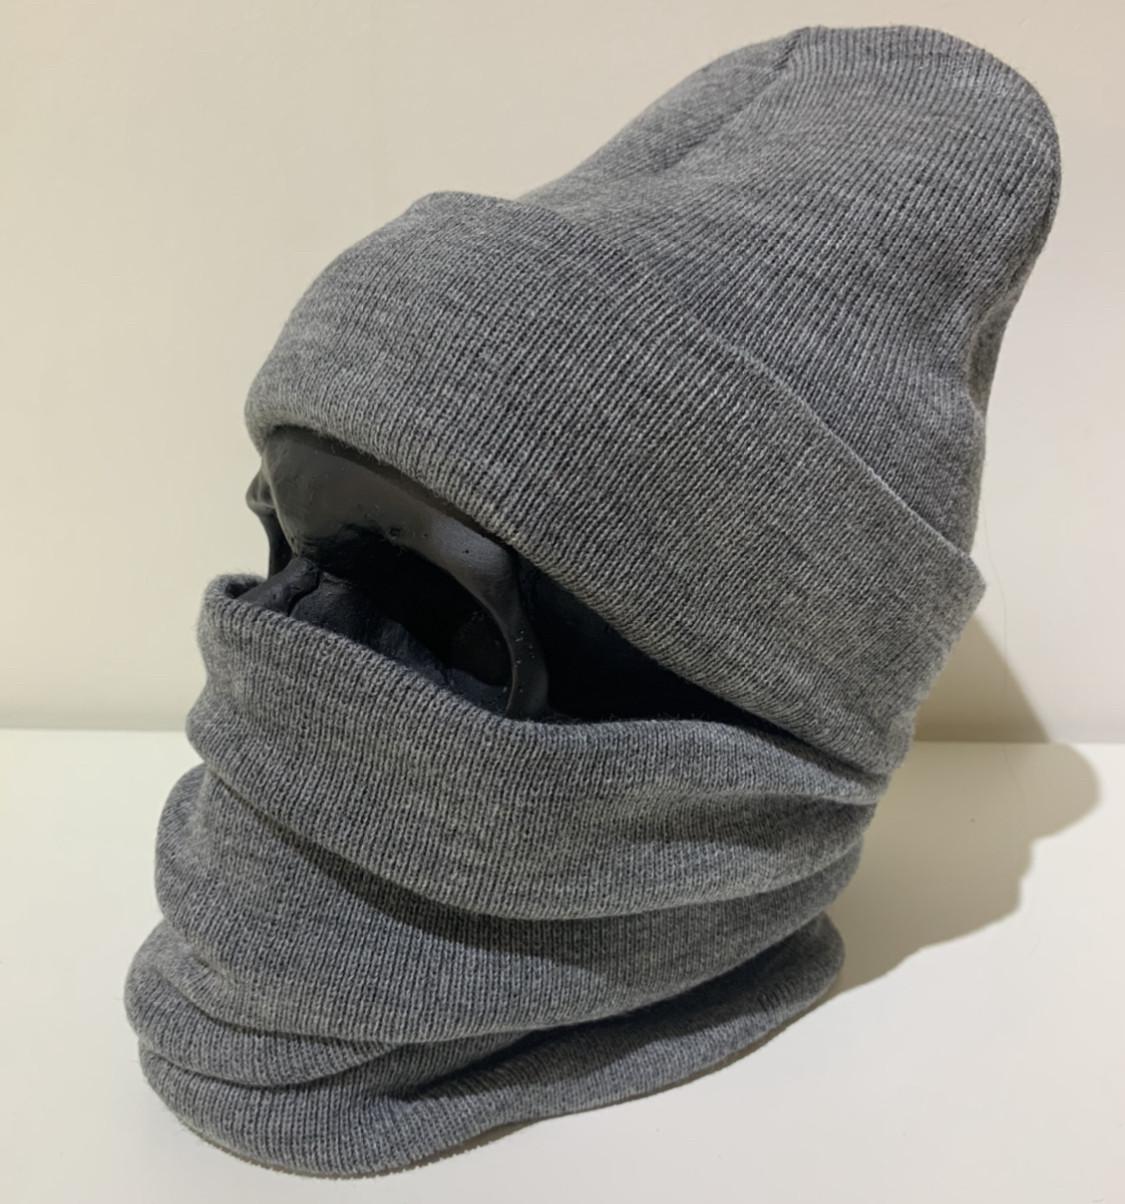 Бафф мужской  - ❄️ Winter ❄️ Серый